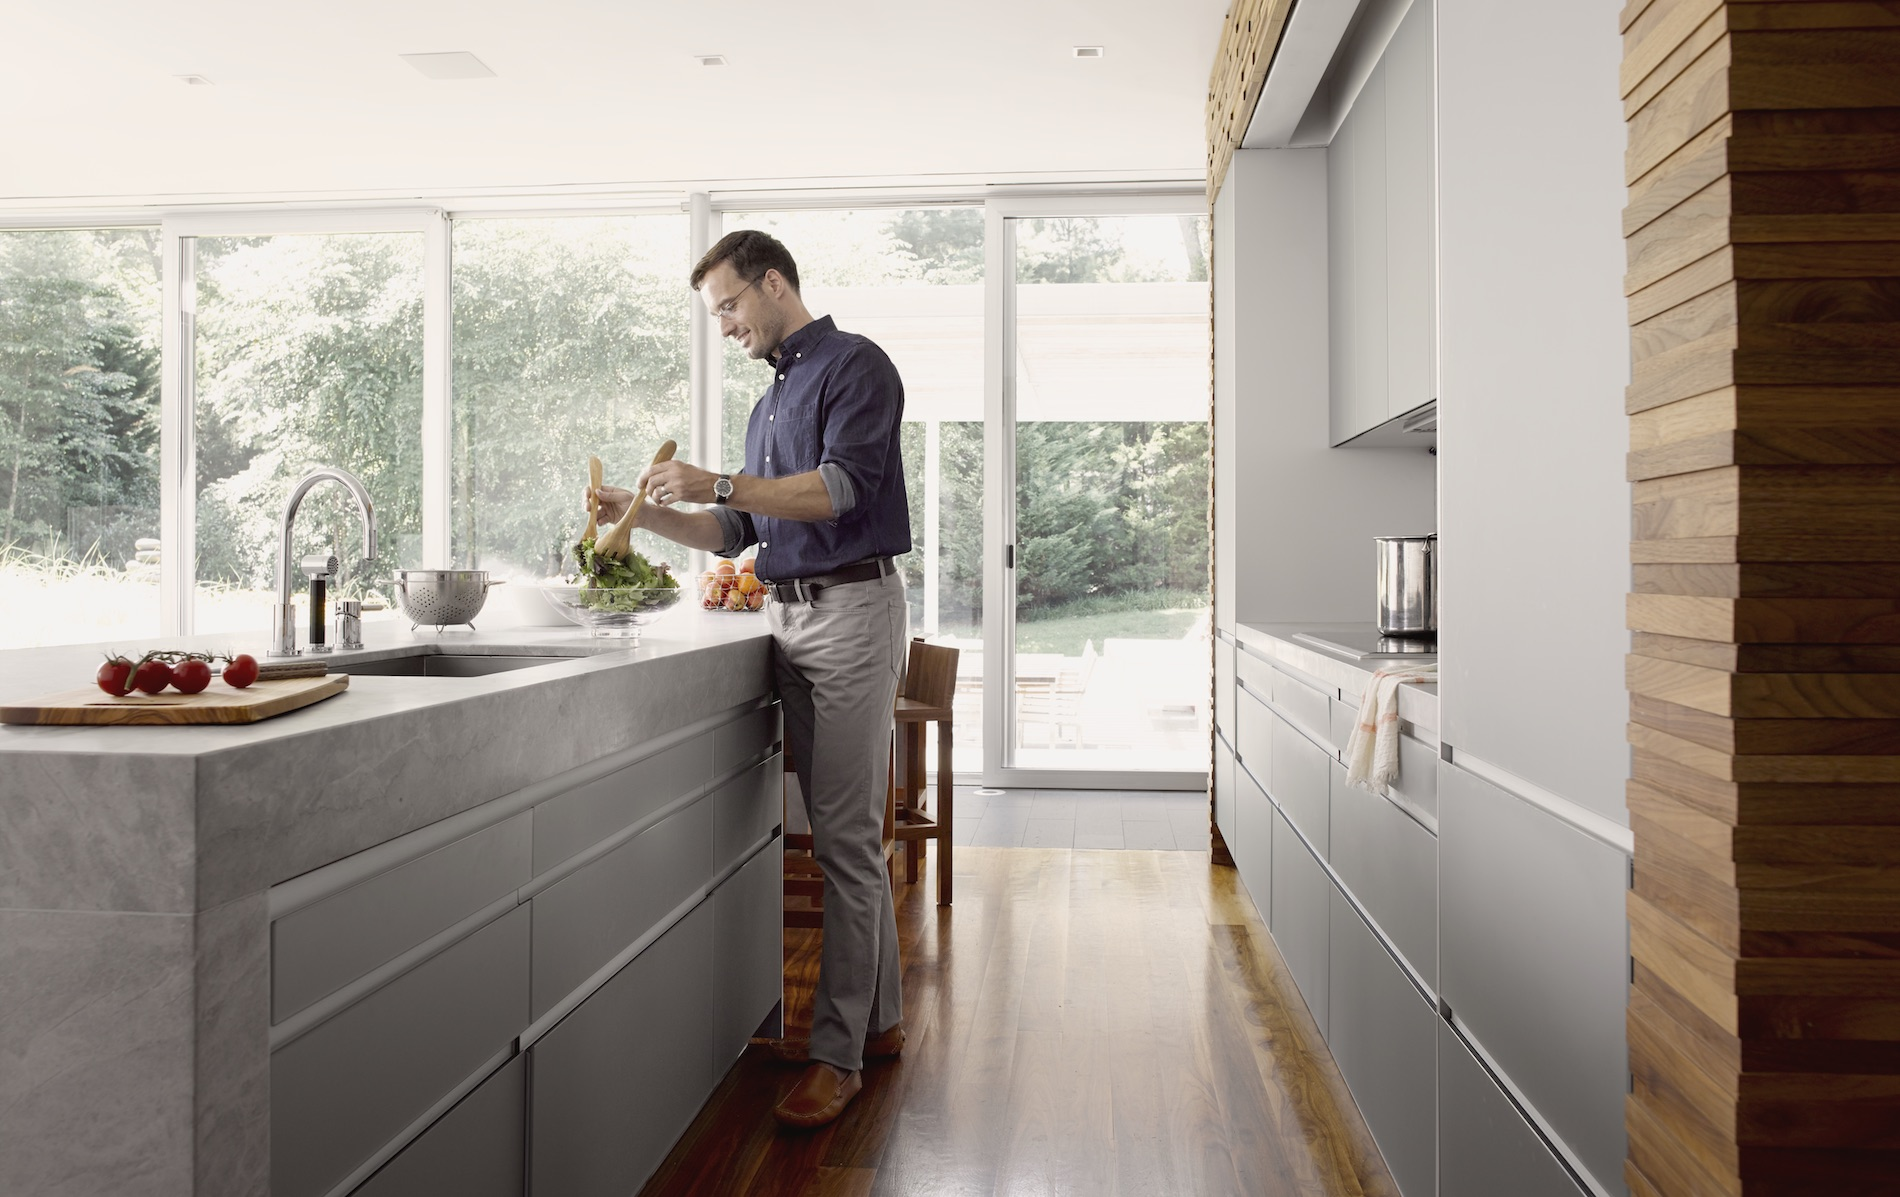 Man in modern kitchen with Savant controls